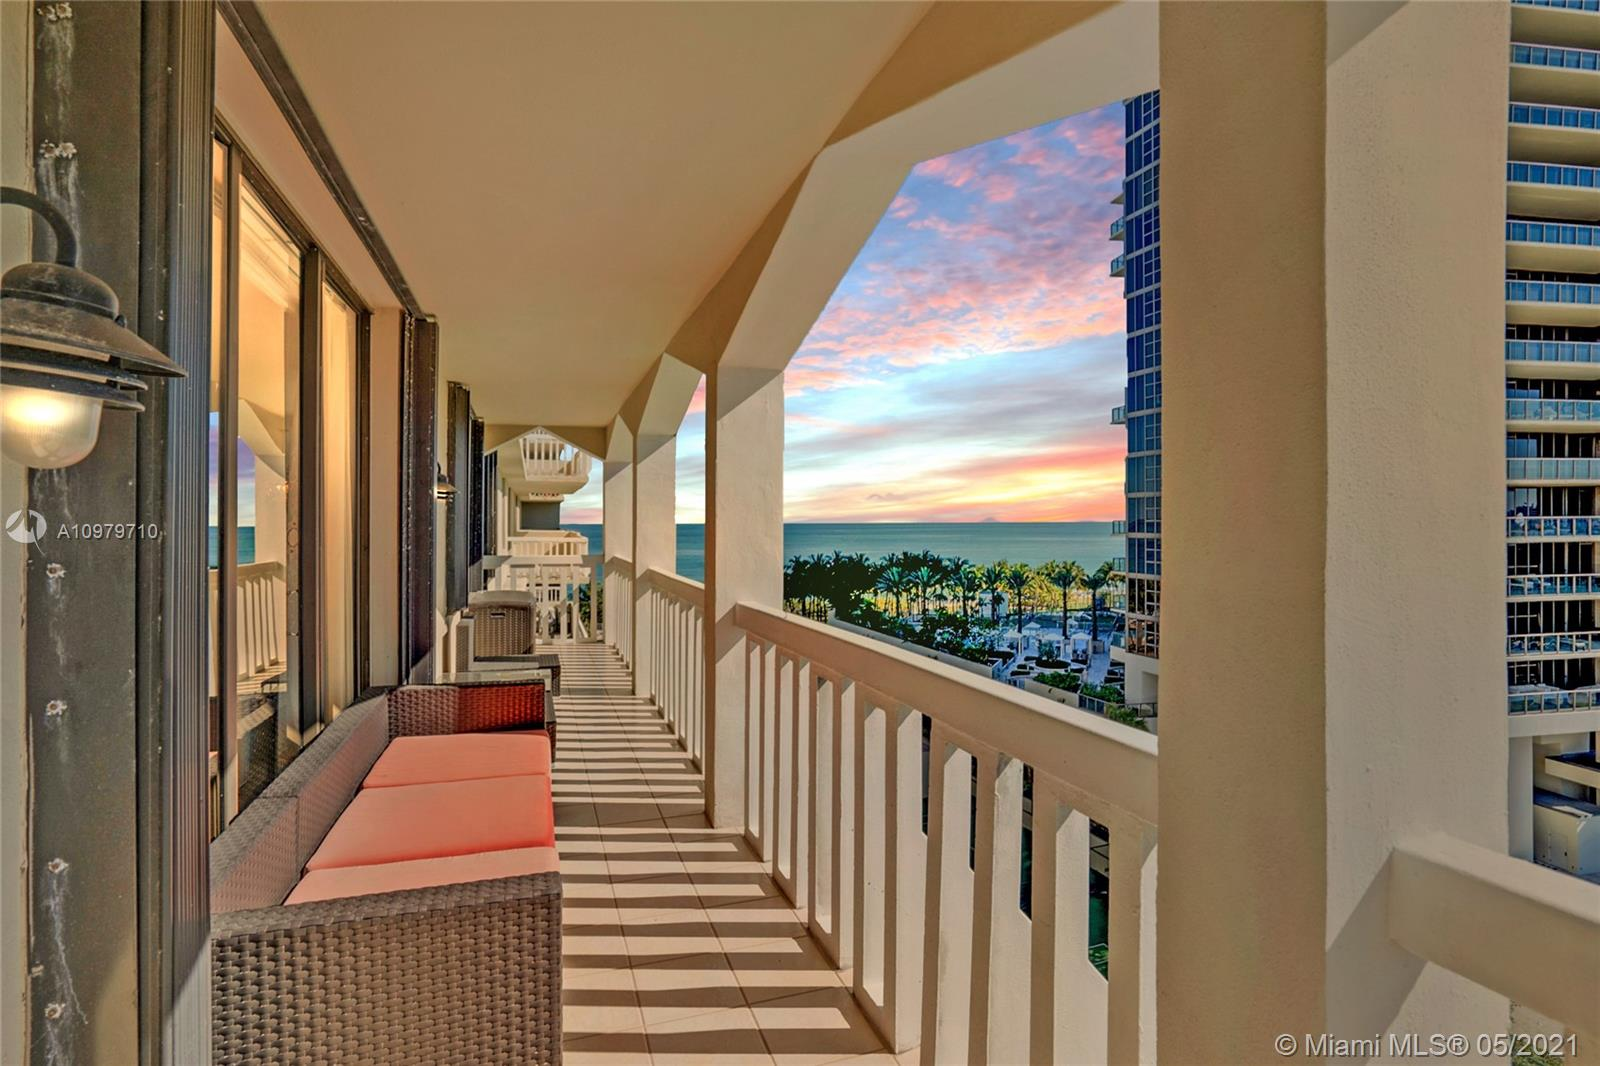 Photo of 9801 Collins Ave #10R, Bal Harbour, Florida, 33154 - Guest bath